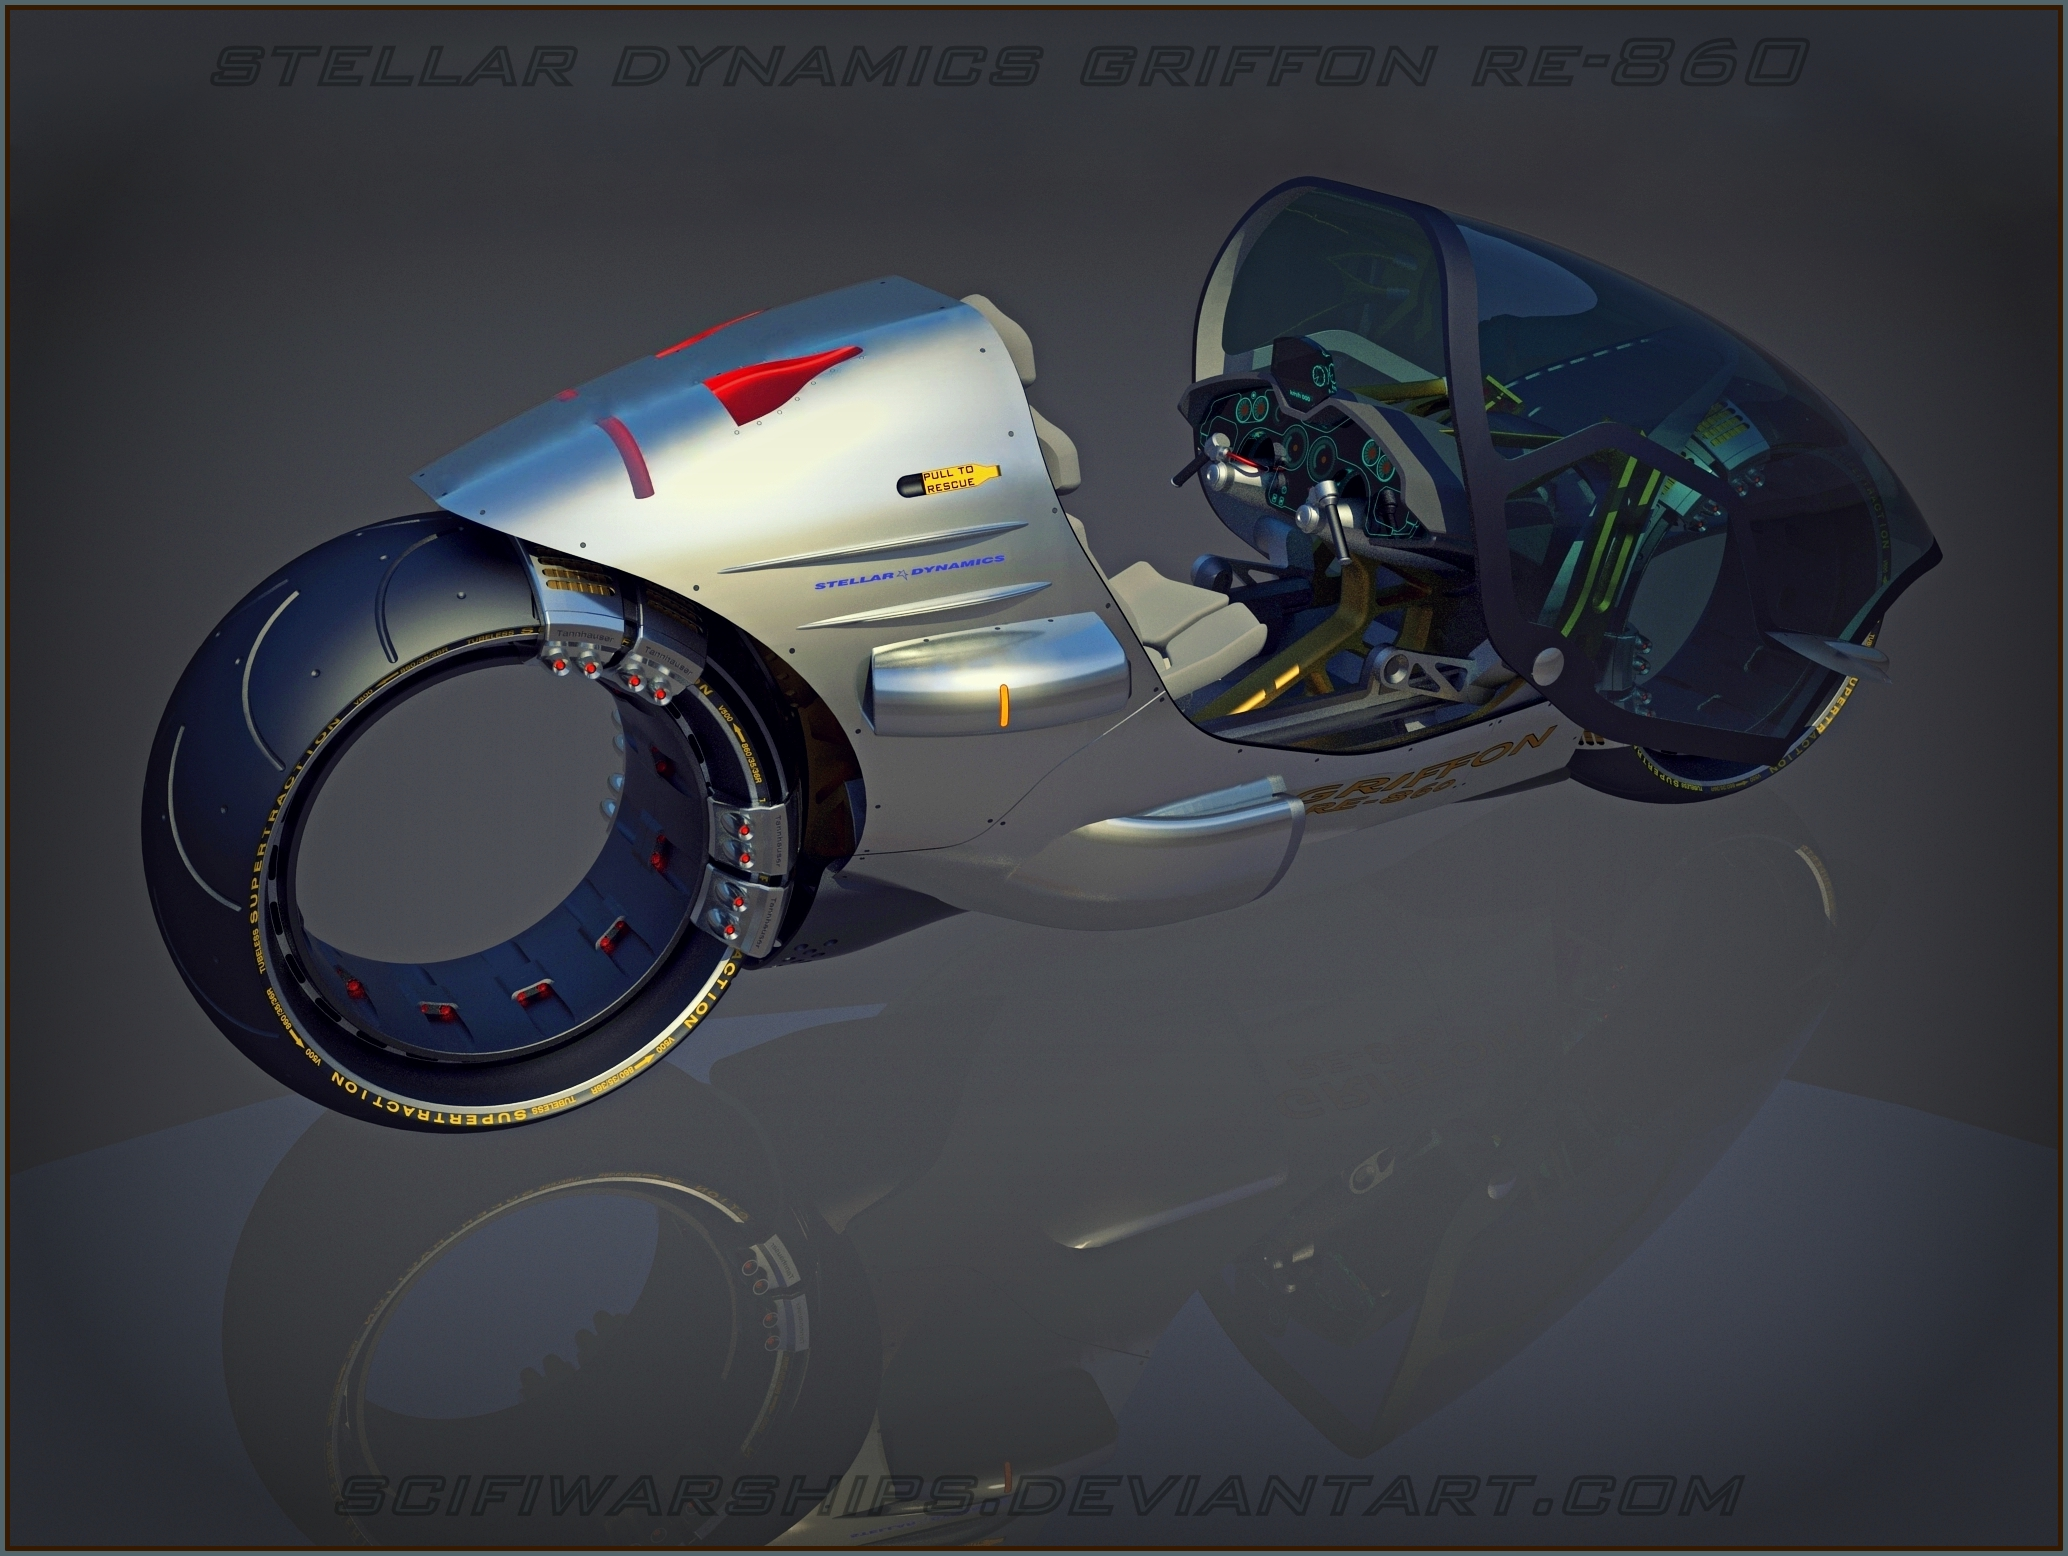 Penny Danvolt Stellar_dynamics_griffon_re_860_3_by_scifiwarships-d5jc8tk